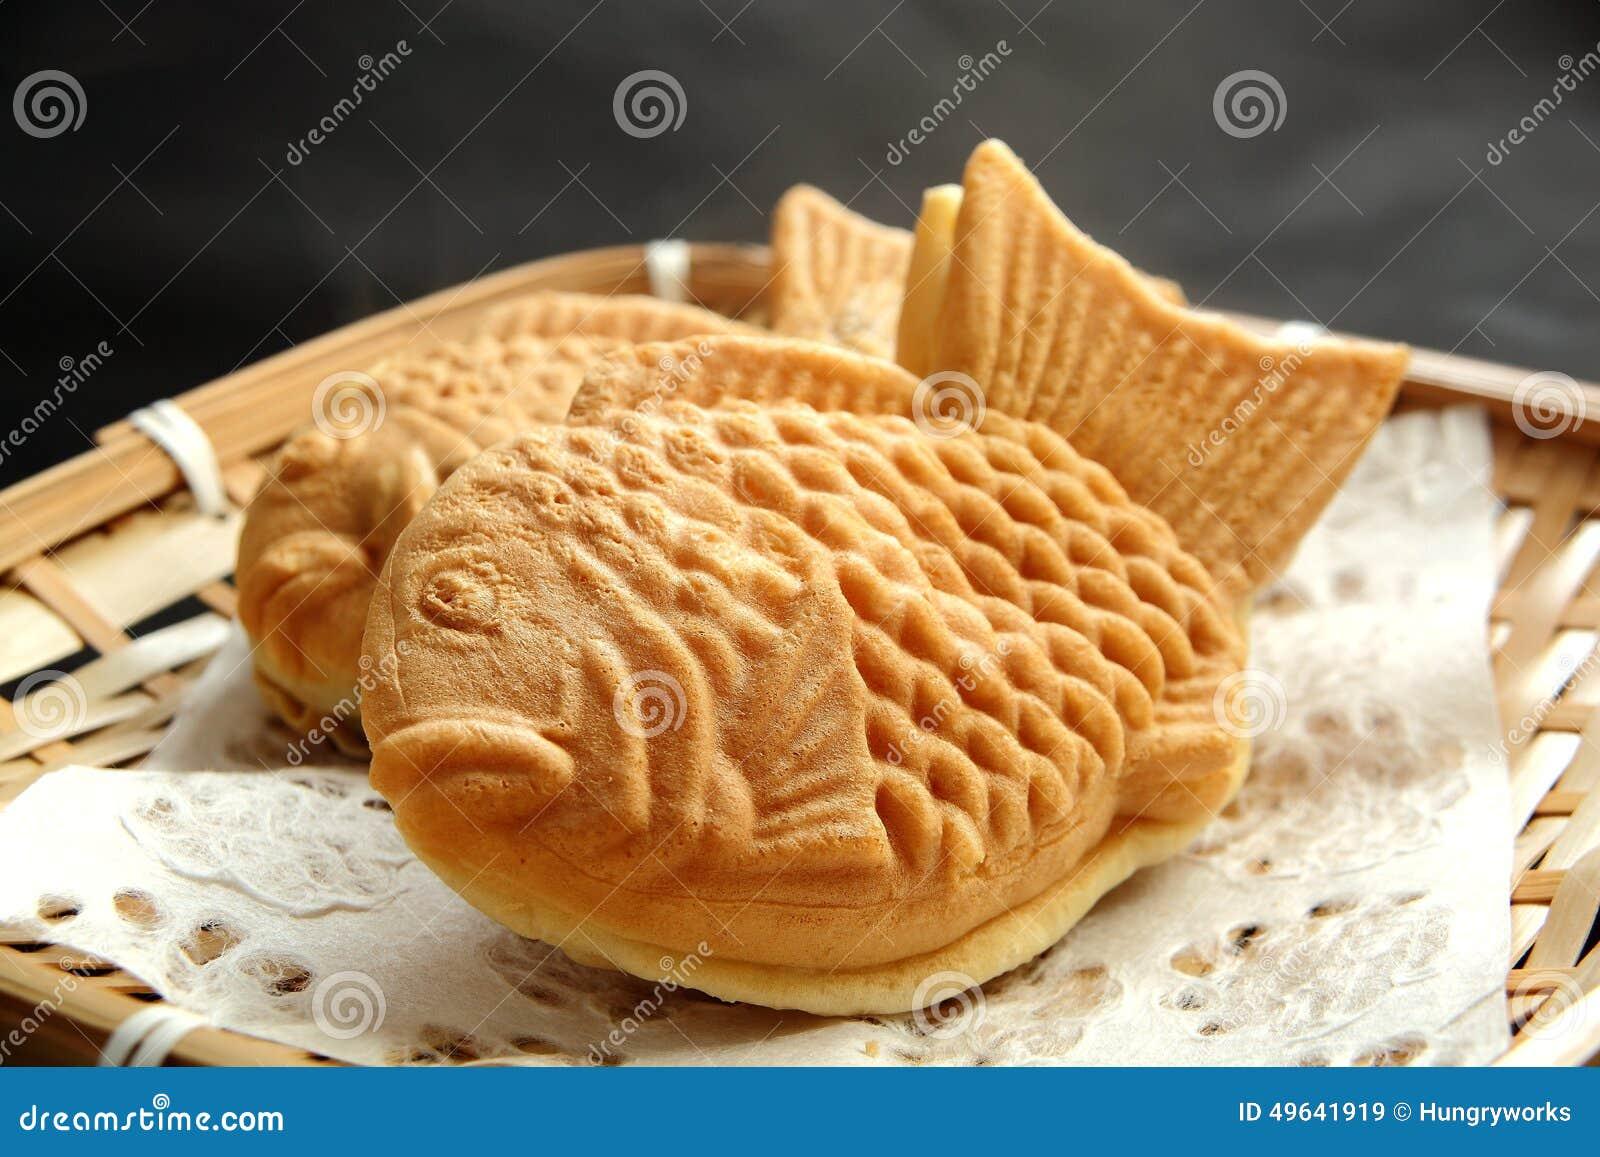 how to make japanese fish cake